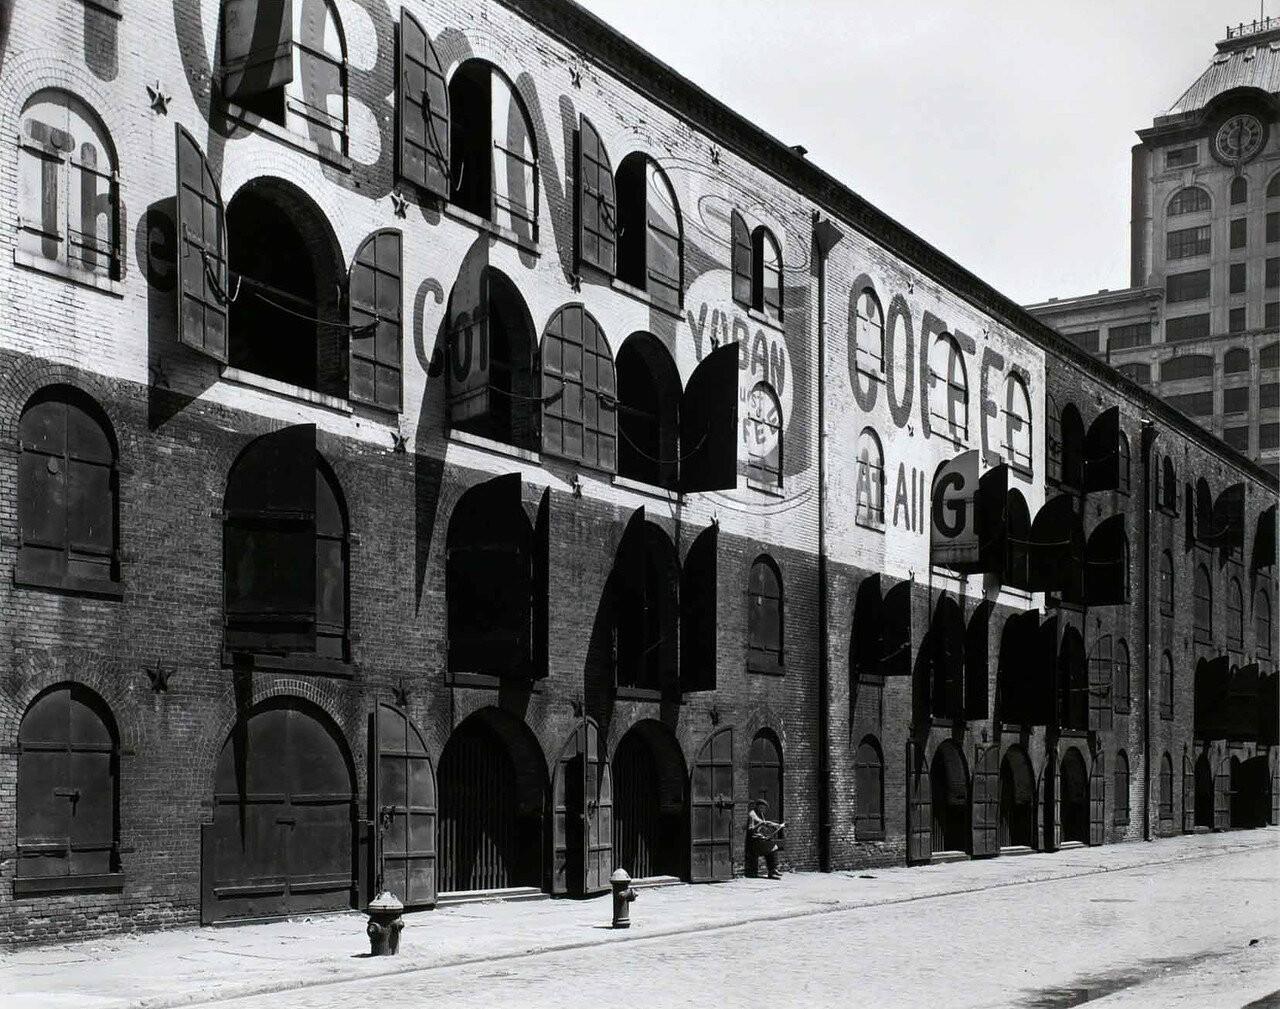 Склад Уотер энд Док-стрит, Бруклин, 22 мая 1936. Автор Беренис Эббот